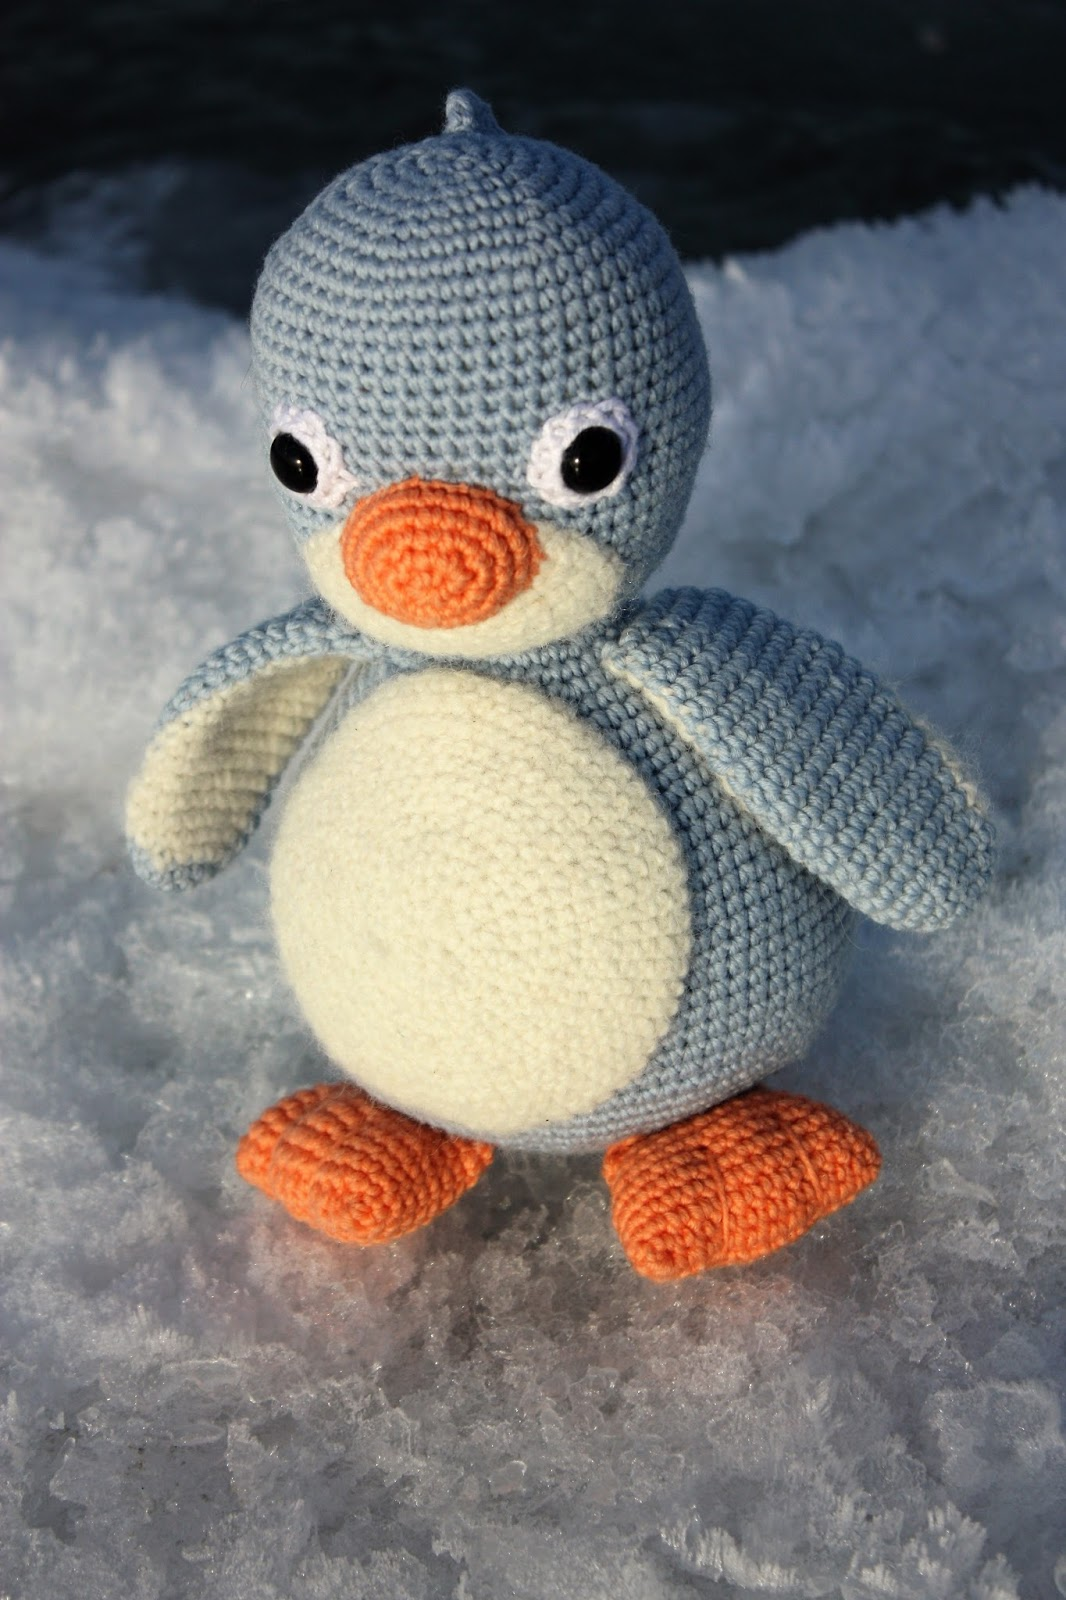 Amigurumi Penguin Crochet : Happyamigurumi amigurumi crochet penguin pattern cara